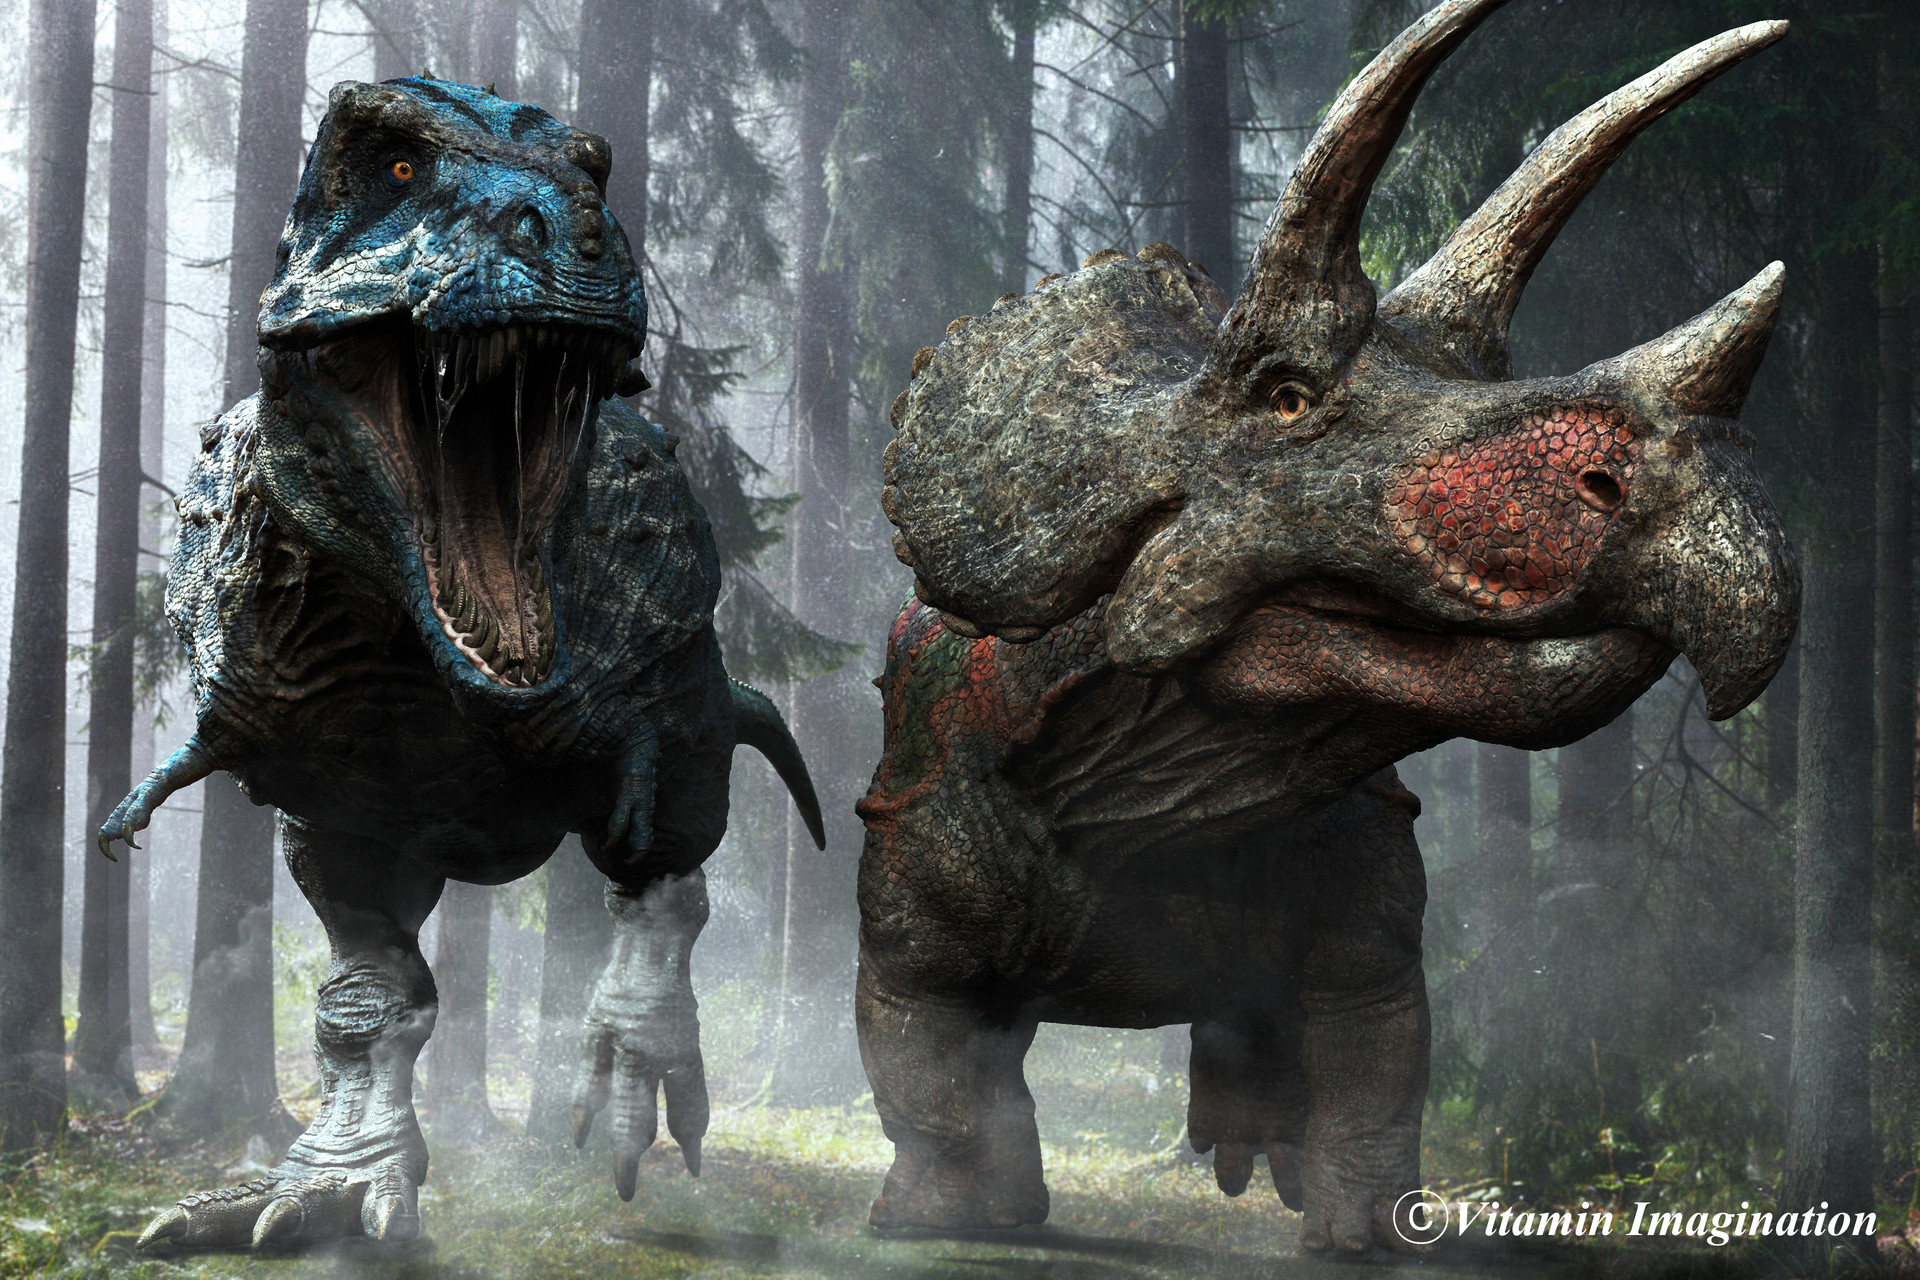 Vitamin Imagination  Tyrannosaurus vs Triceratops 2017 by Vitamin Imaigination